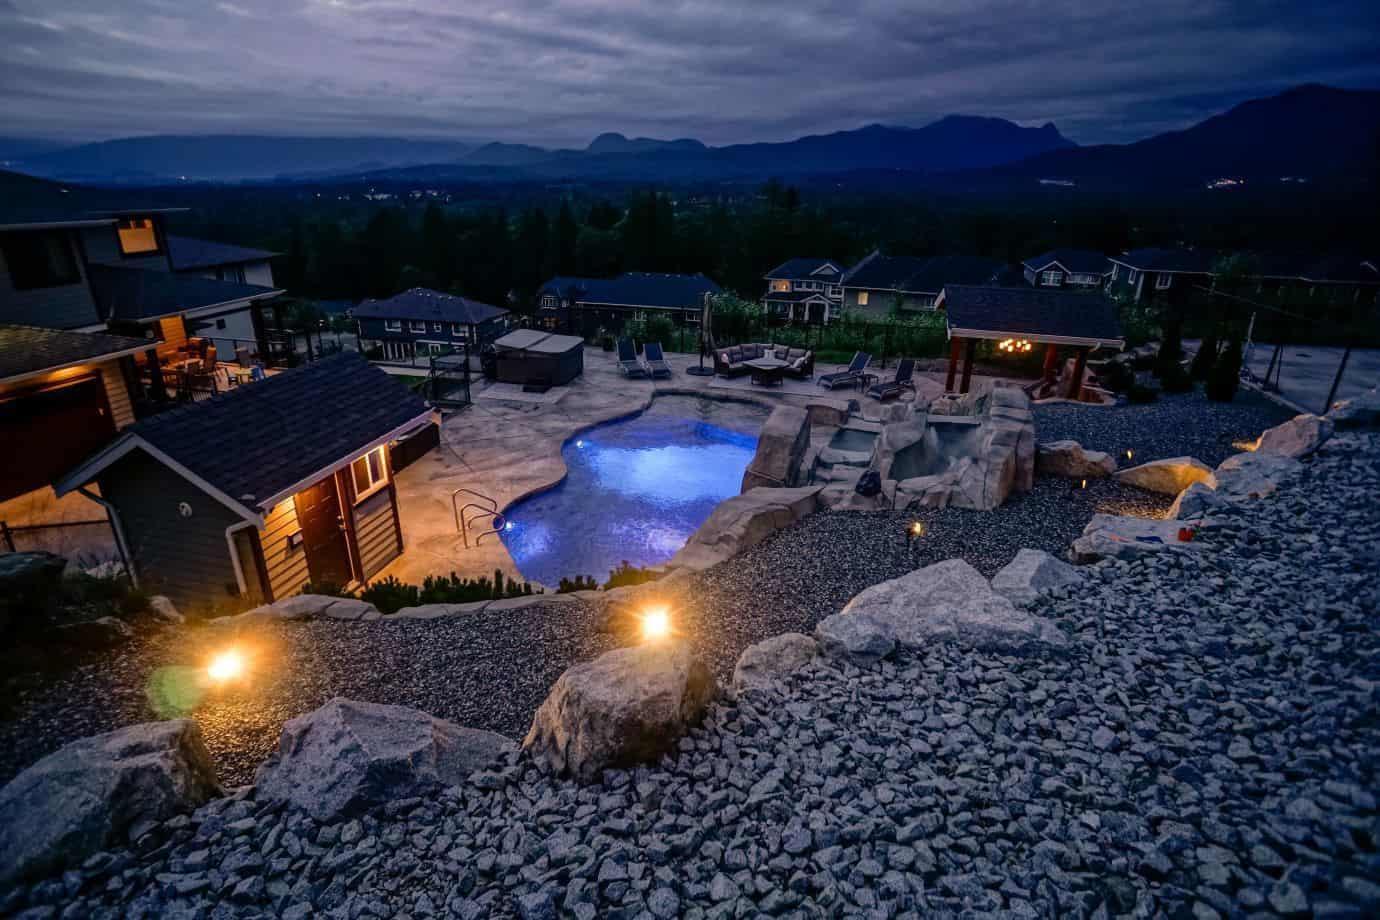 azuro-backyard-design-Carm04